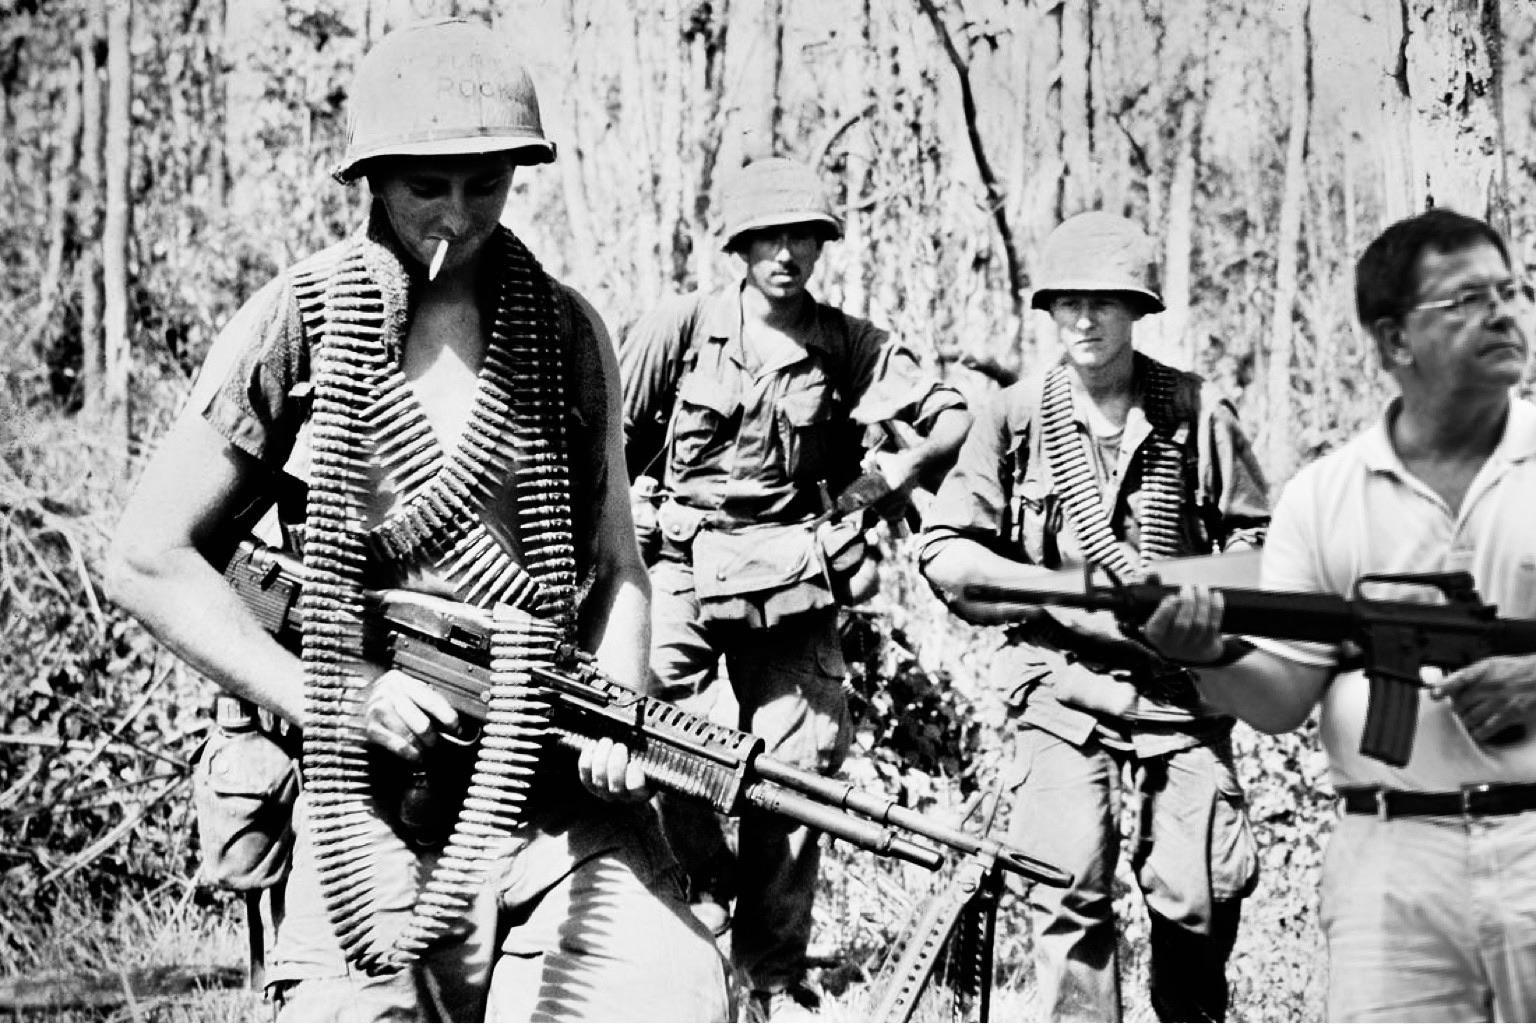 My dad in Vietnam.